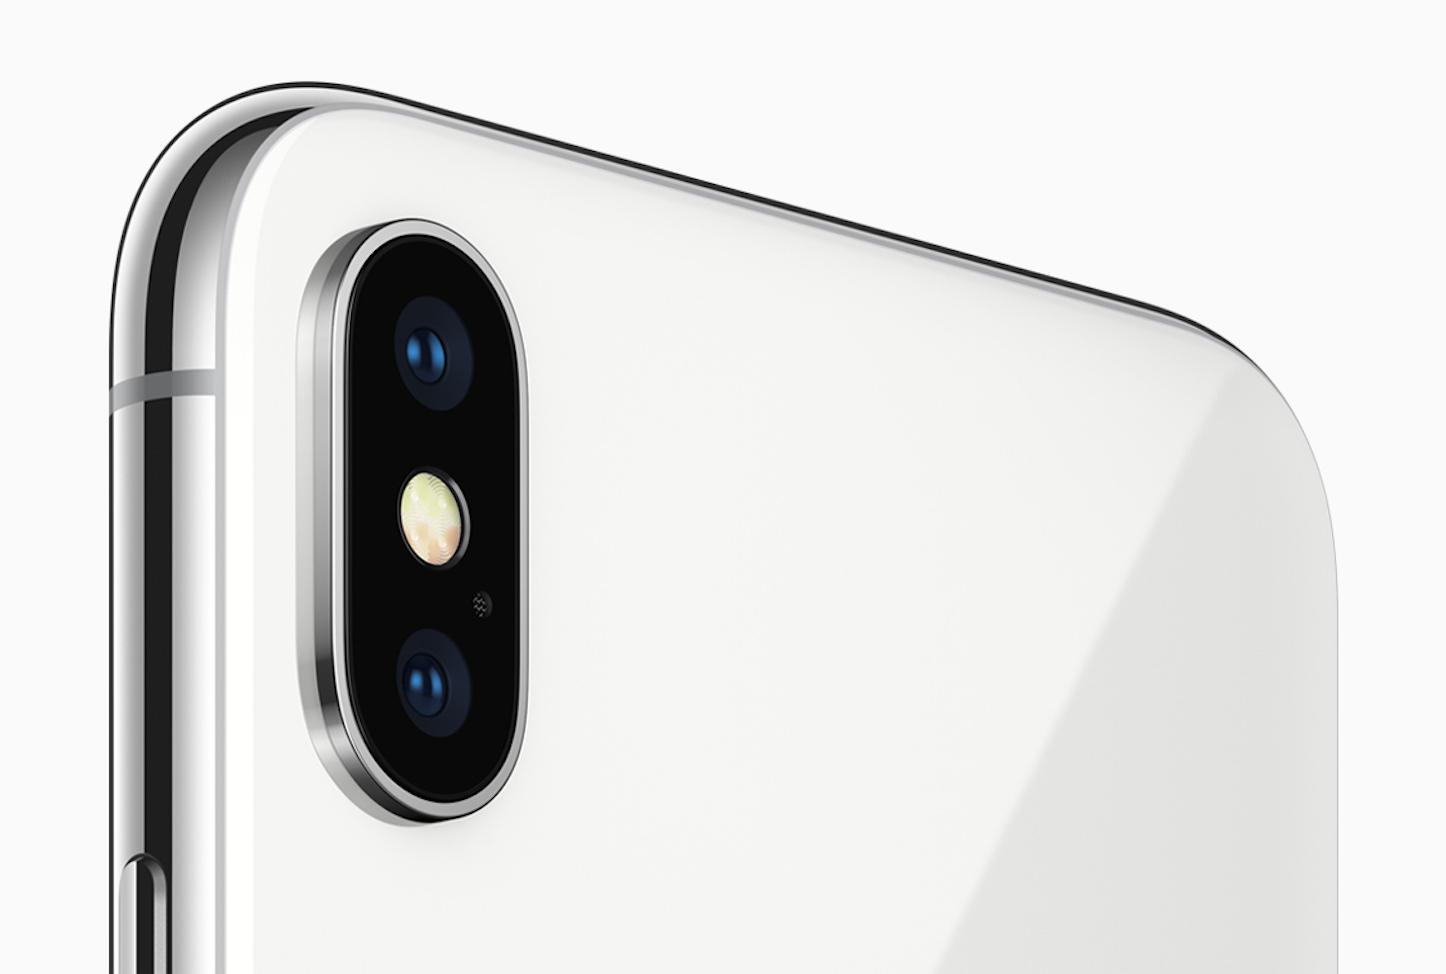 iphonex-truedepth-back-camera.jpg